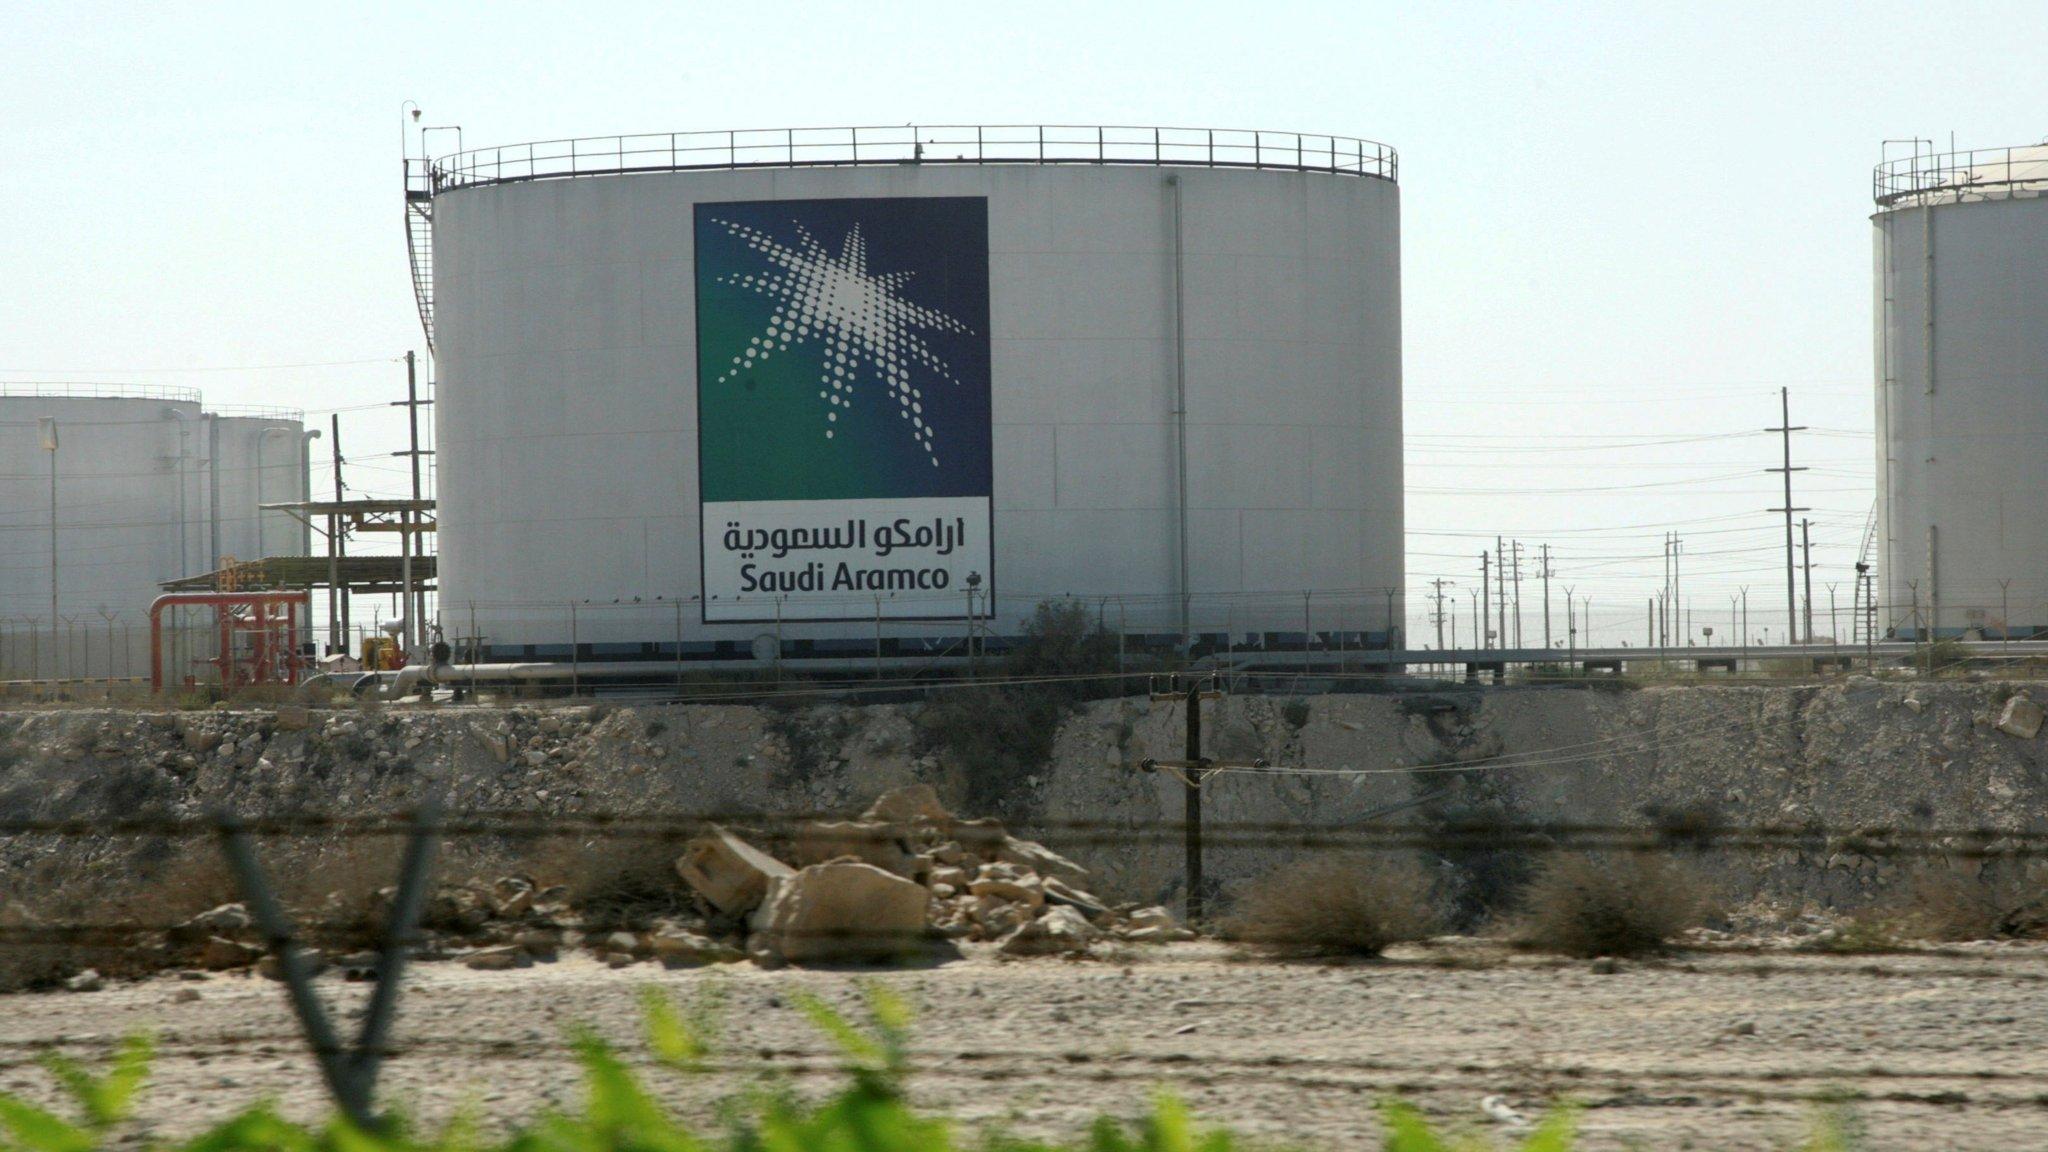 Saudi Aramco executives see ride-sharing as threat to oil demand